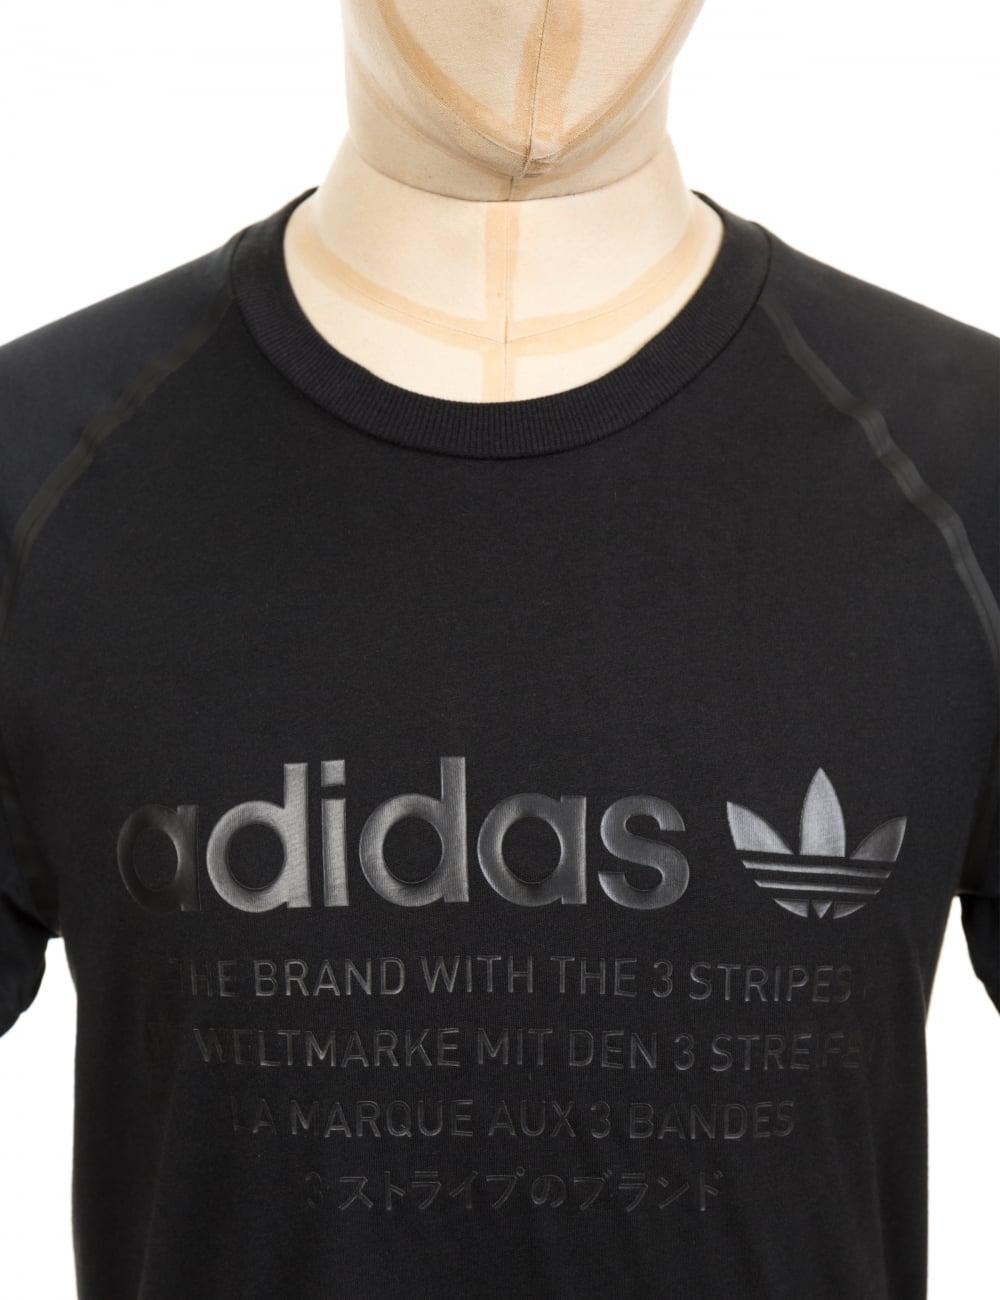 e7d20d1efcea0 Adidas Originals NMD D Tee - Black - Clothing from Fat Buddha Store UK